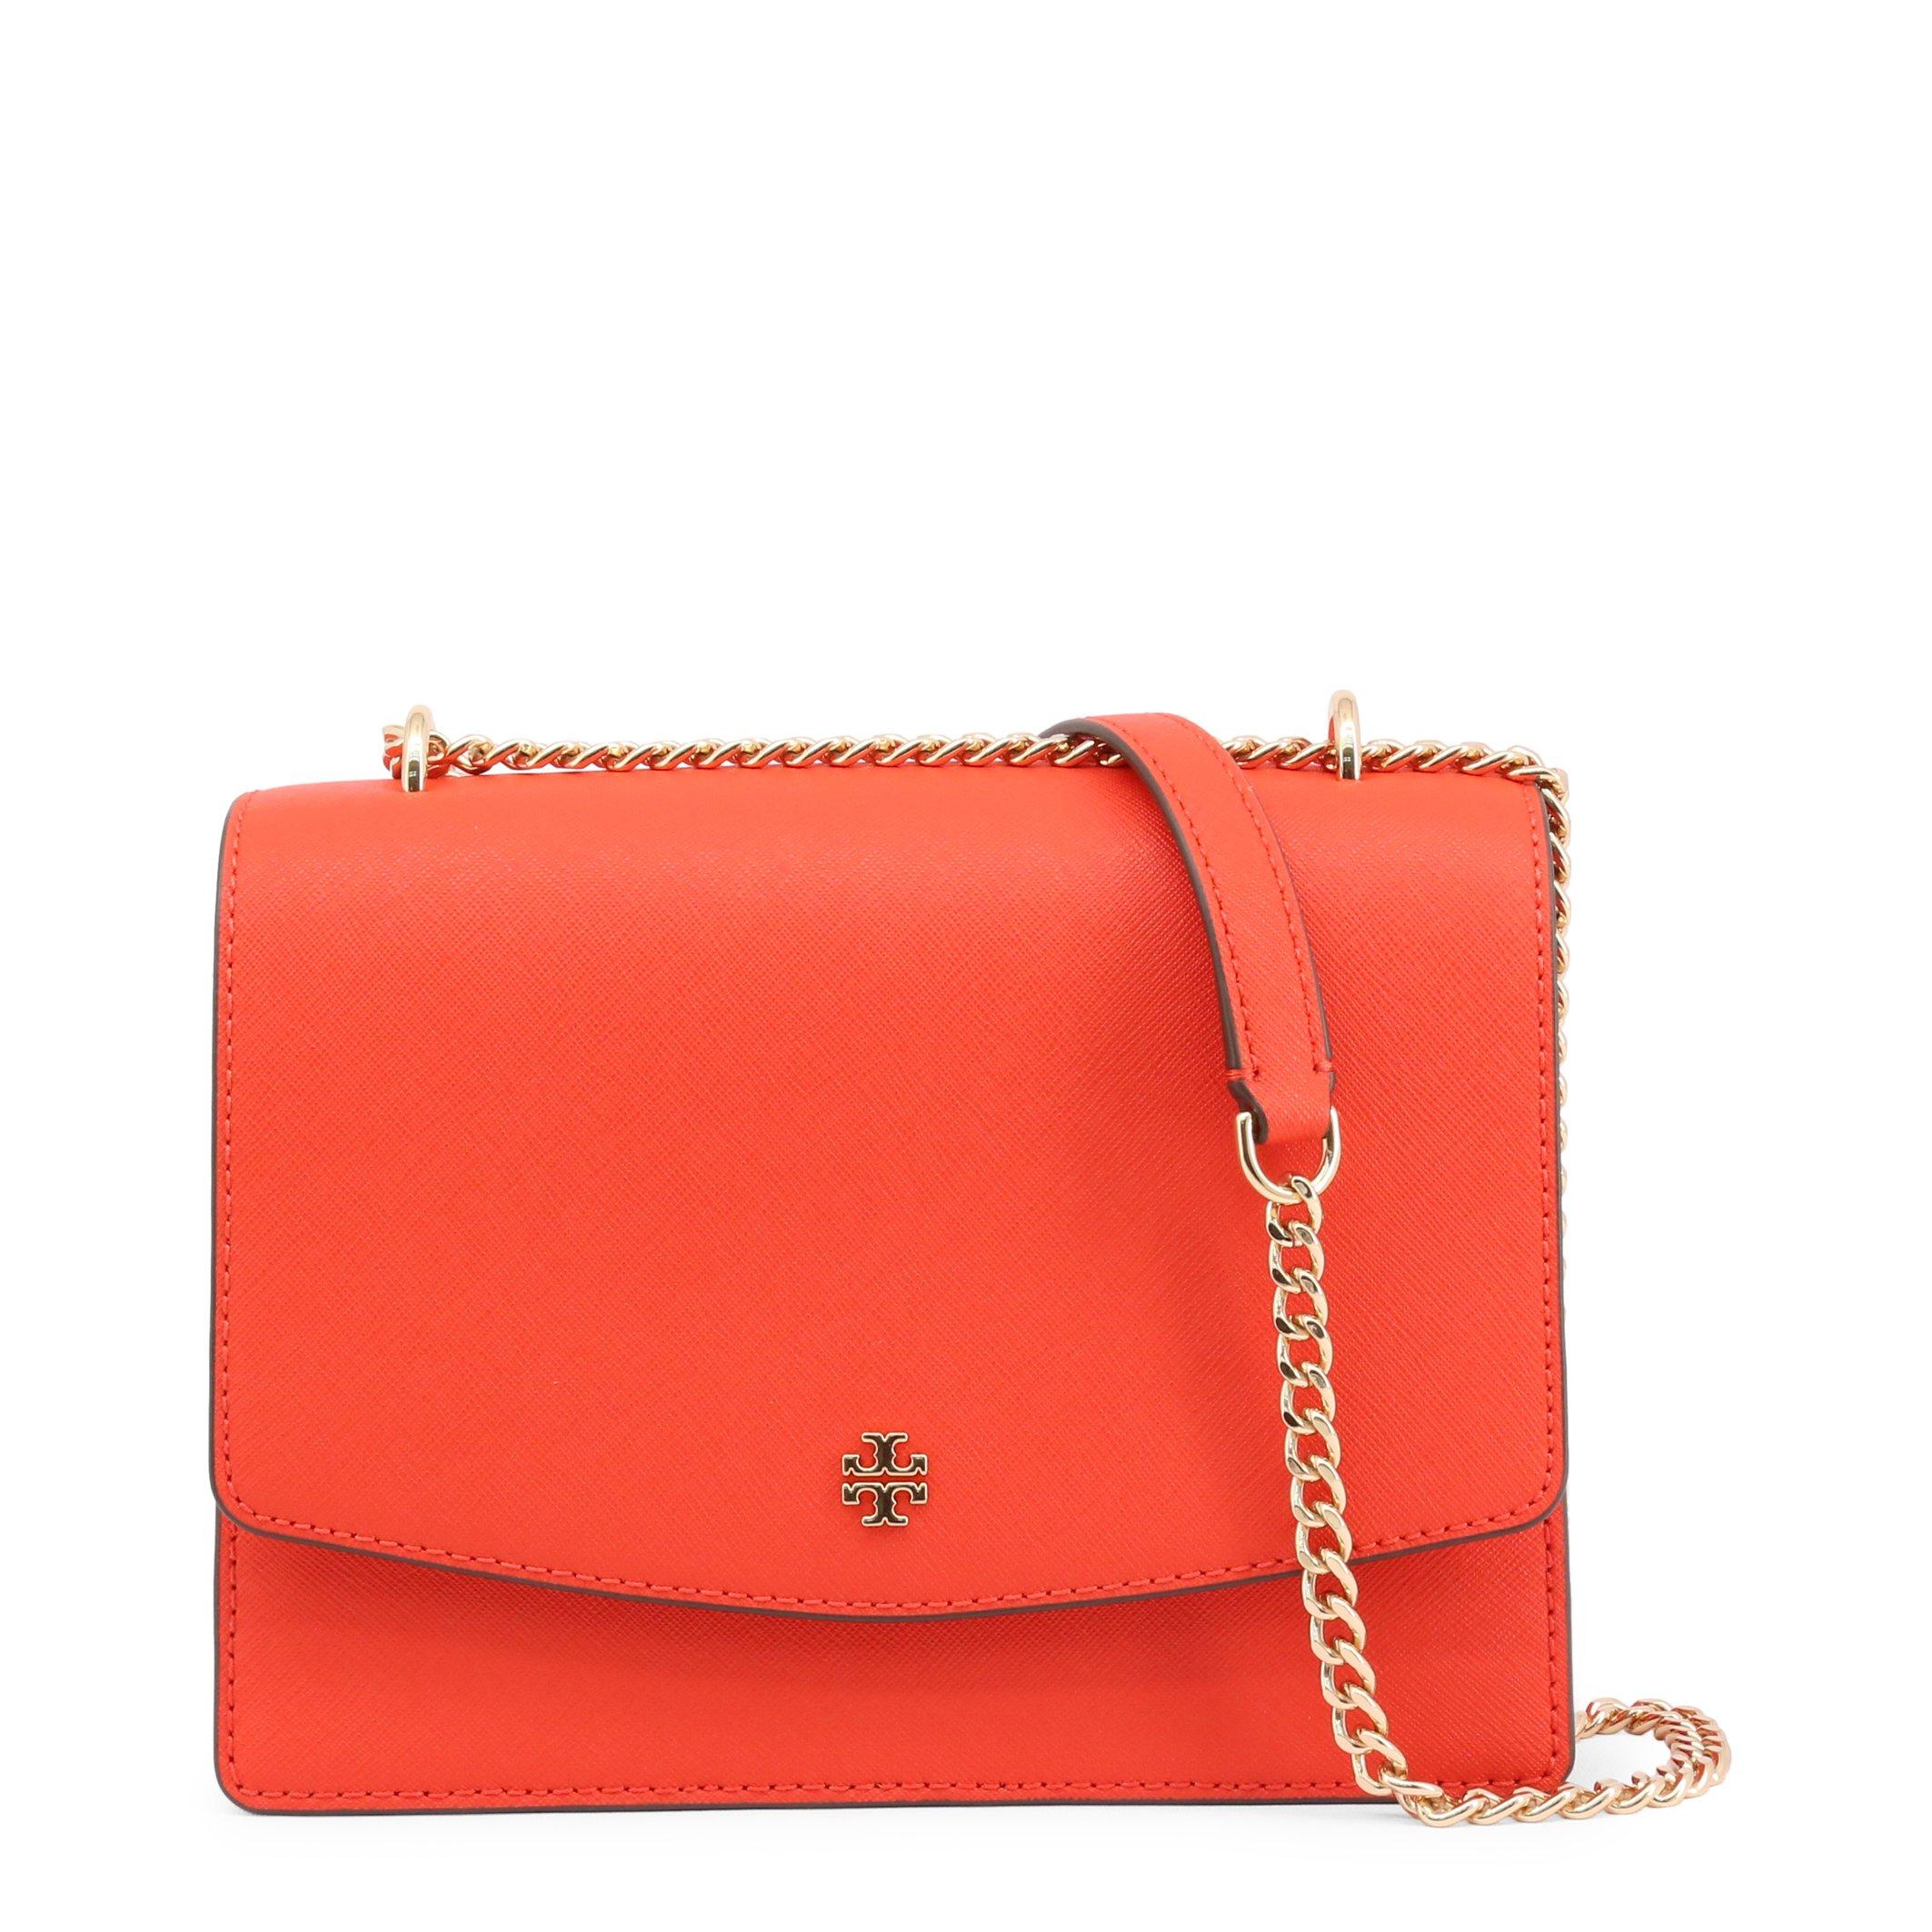 Tory Burch Women's Shoulder Bag Various Colours 78604 - red NOSIZE